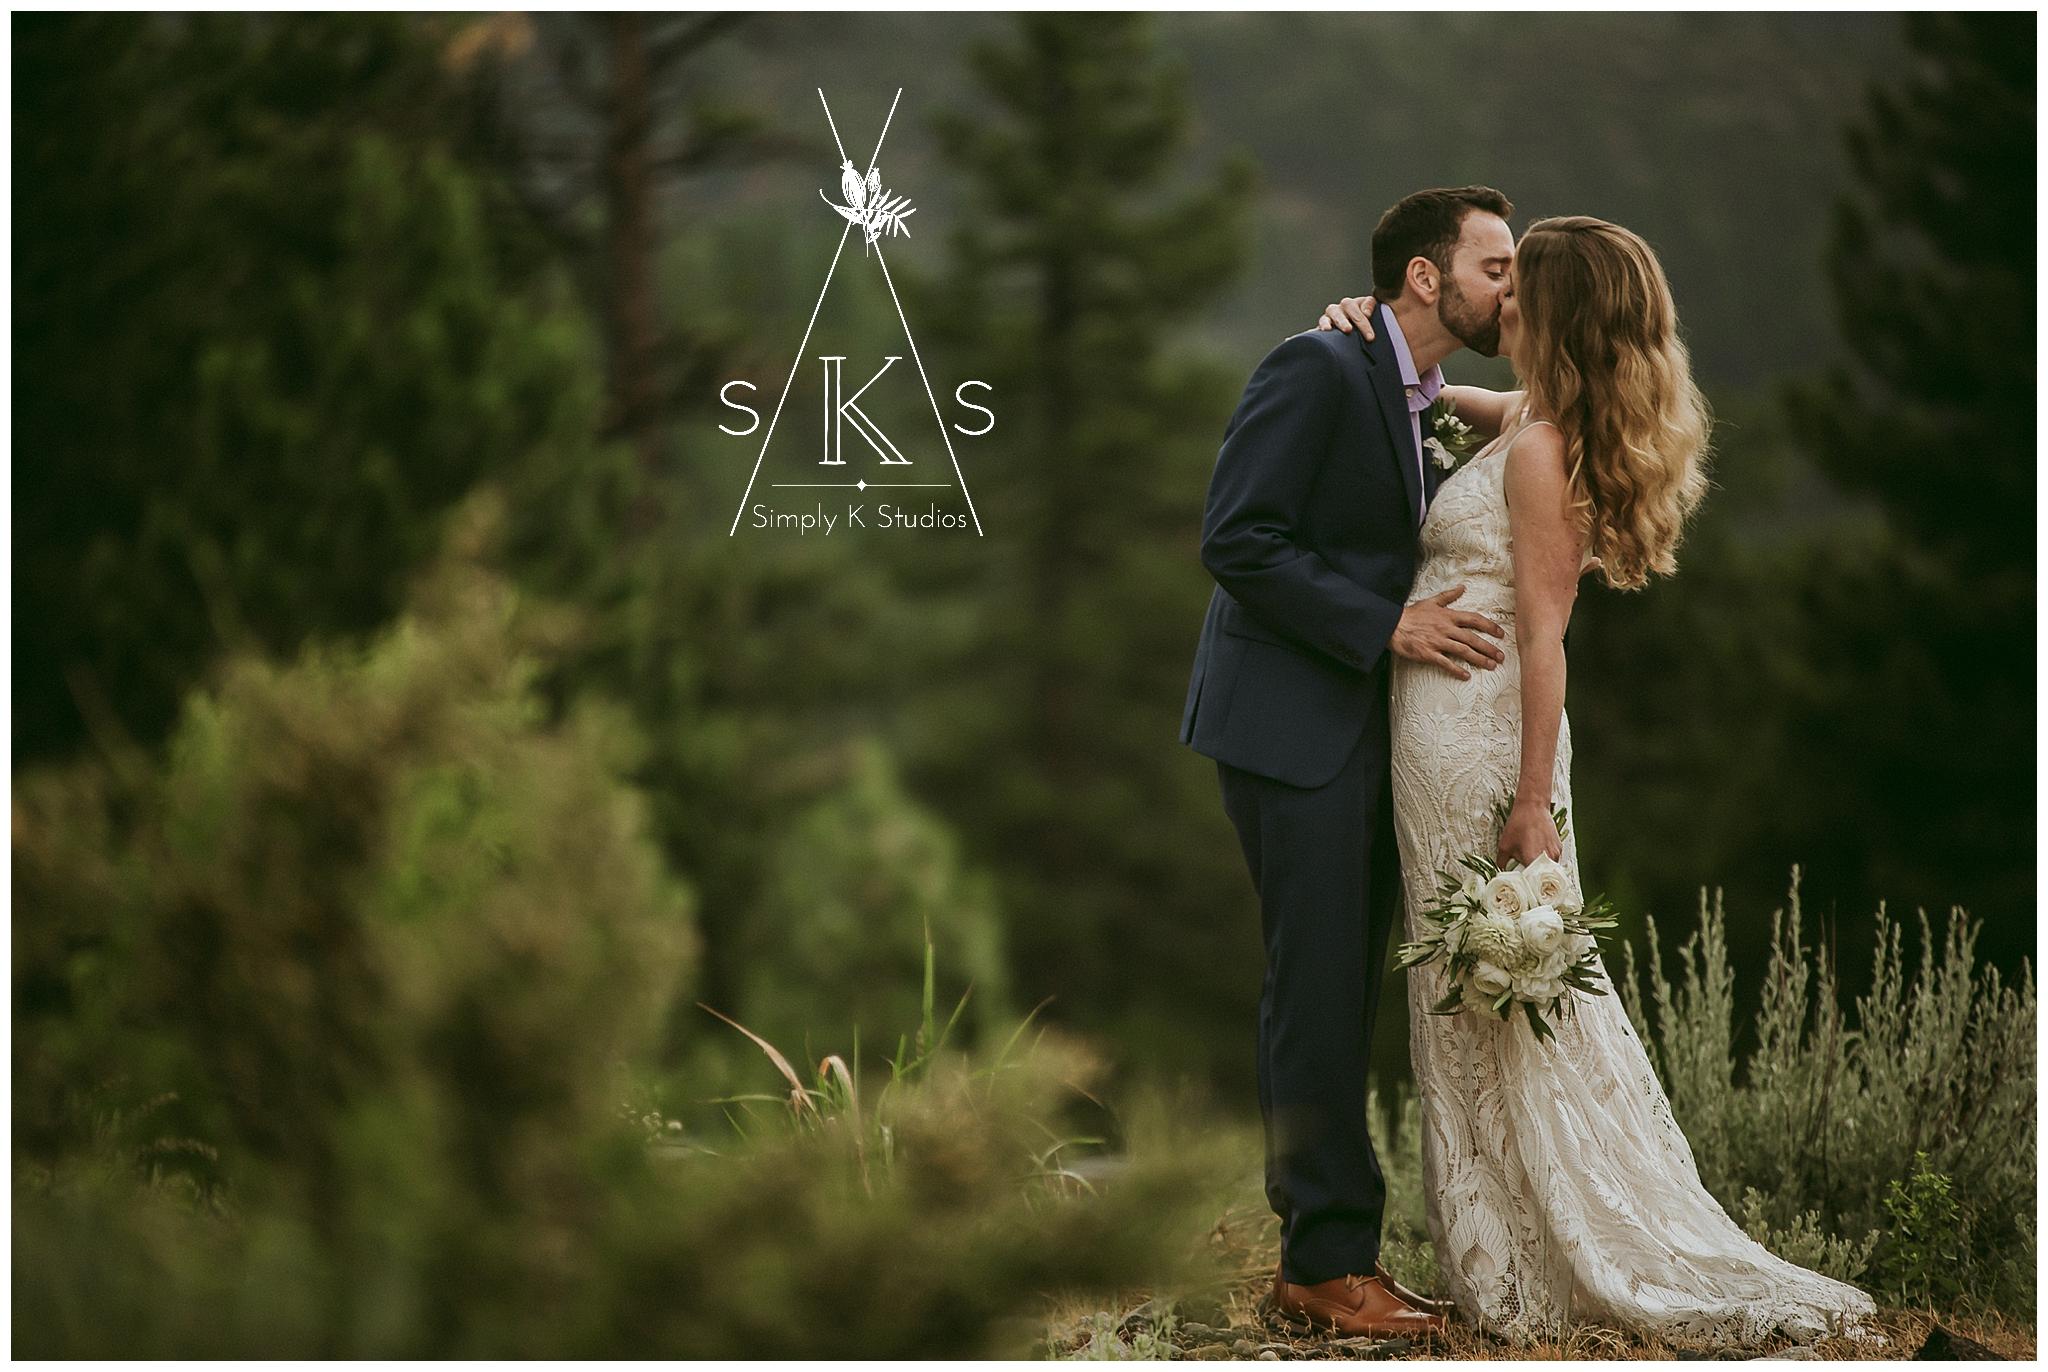 95 Simply K Studios Wedding Photographers near Lake Tahoe NV.jpg